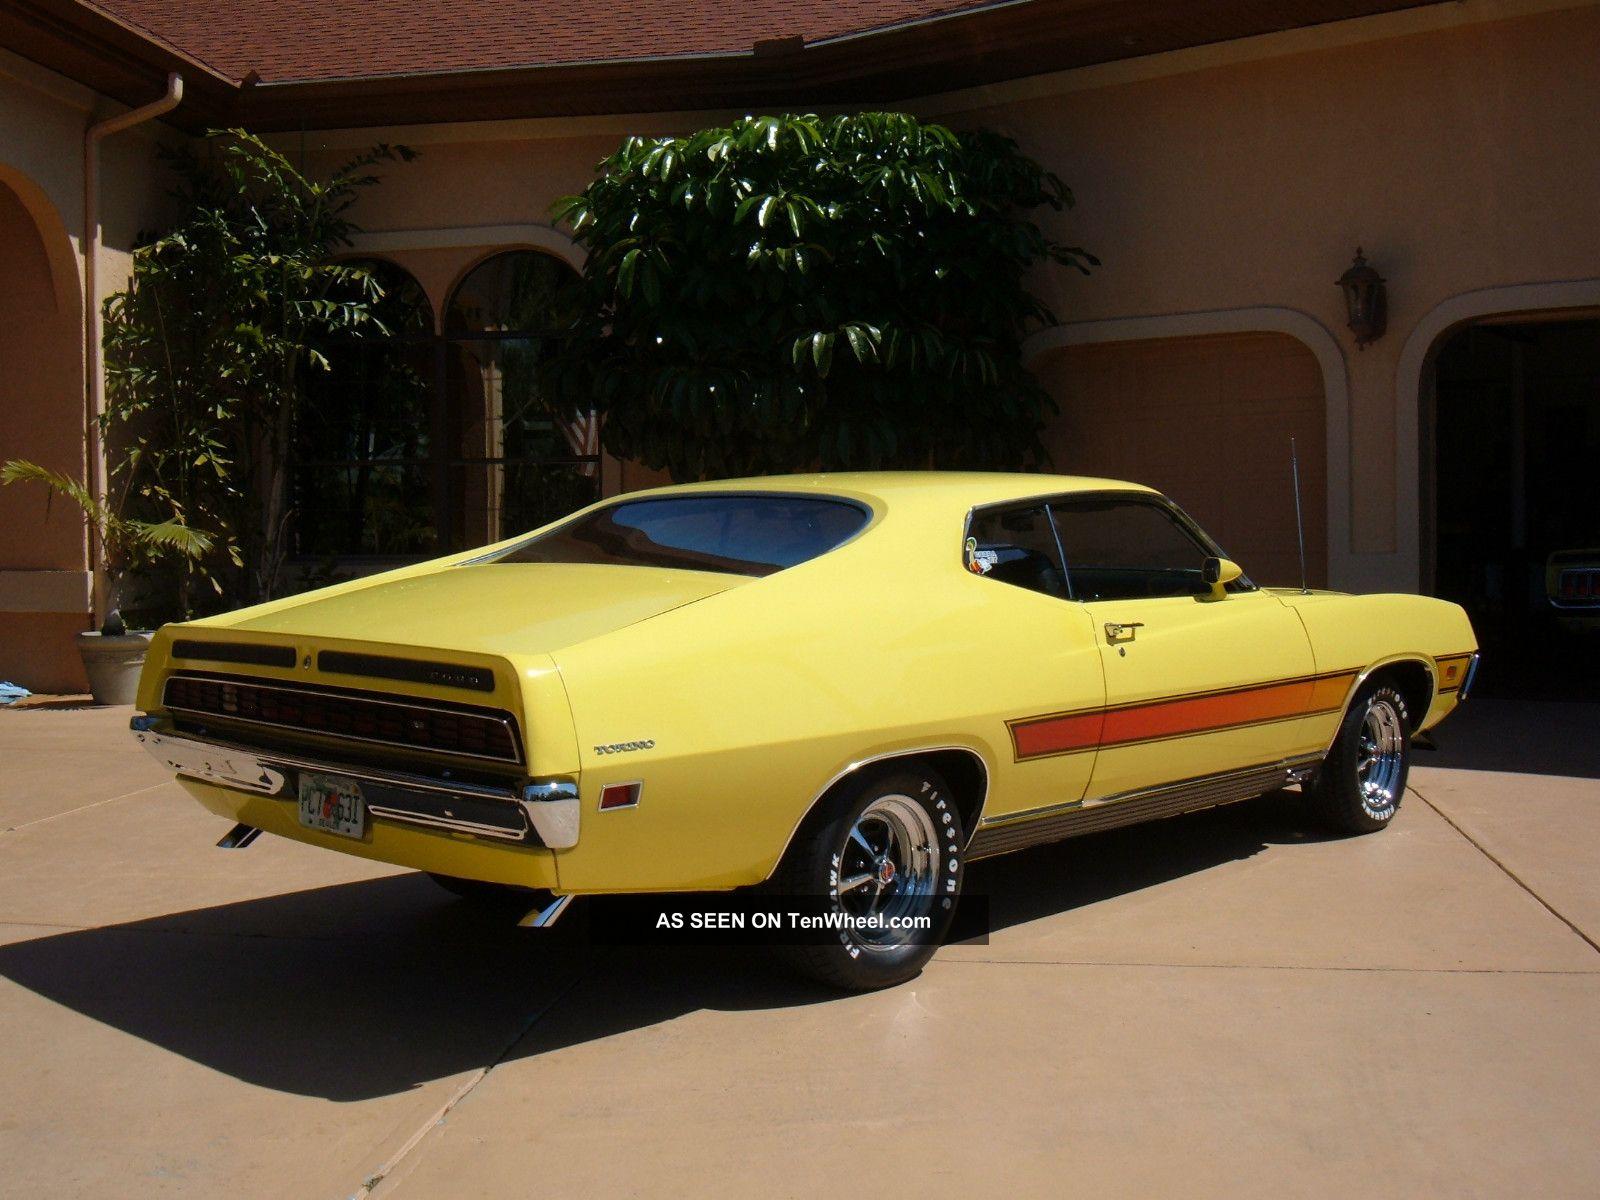 Ford Torino Gt Grabber Yellow   Spd Shaker Hood Marti Report